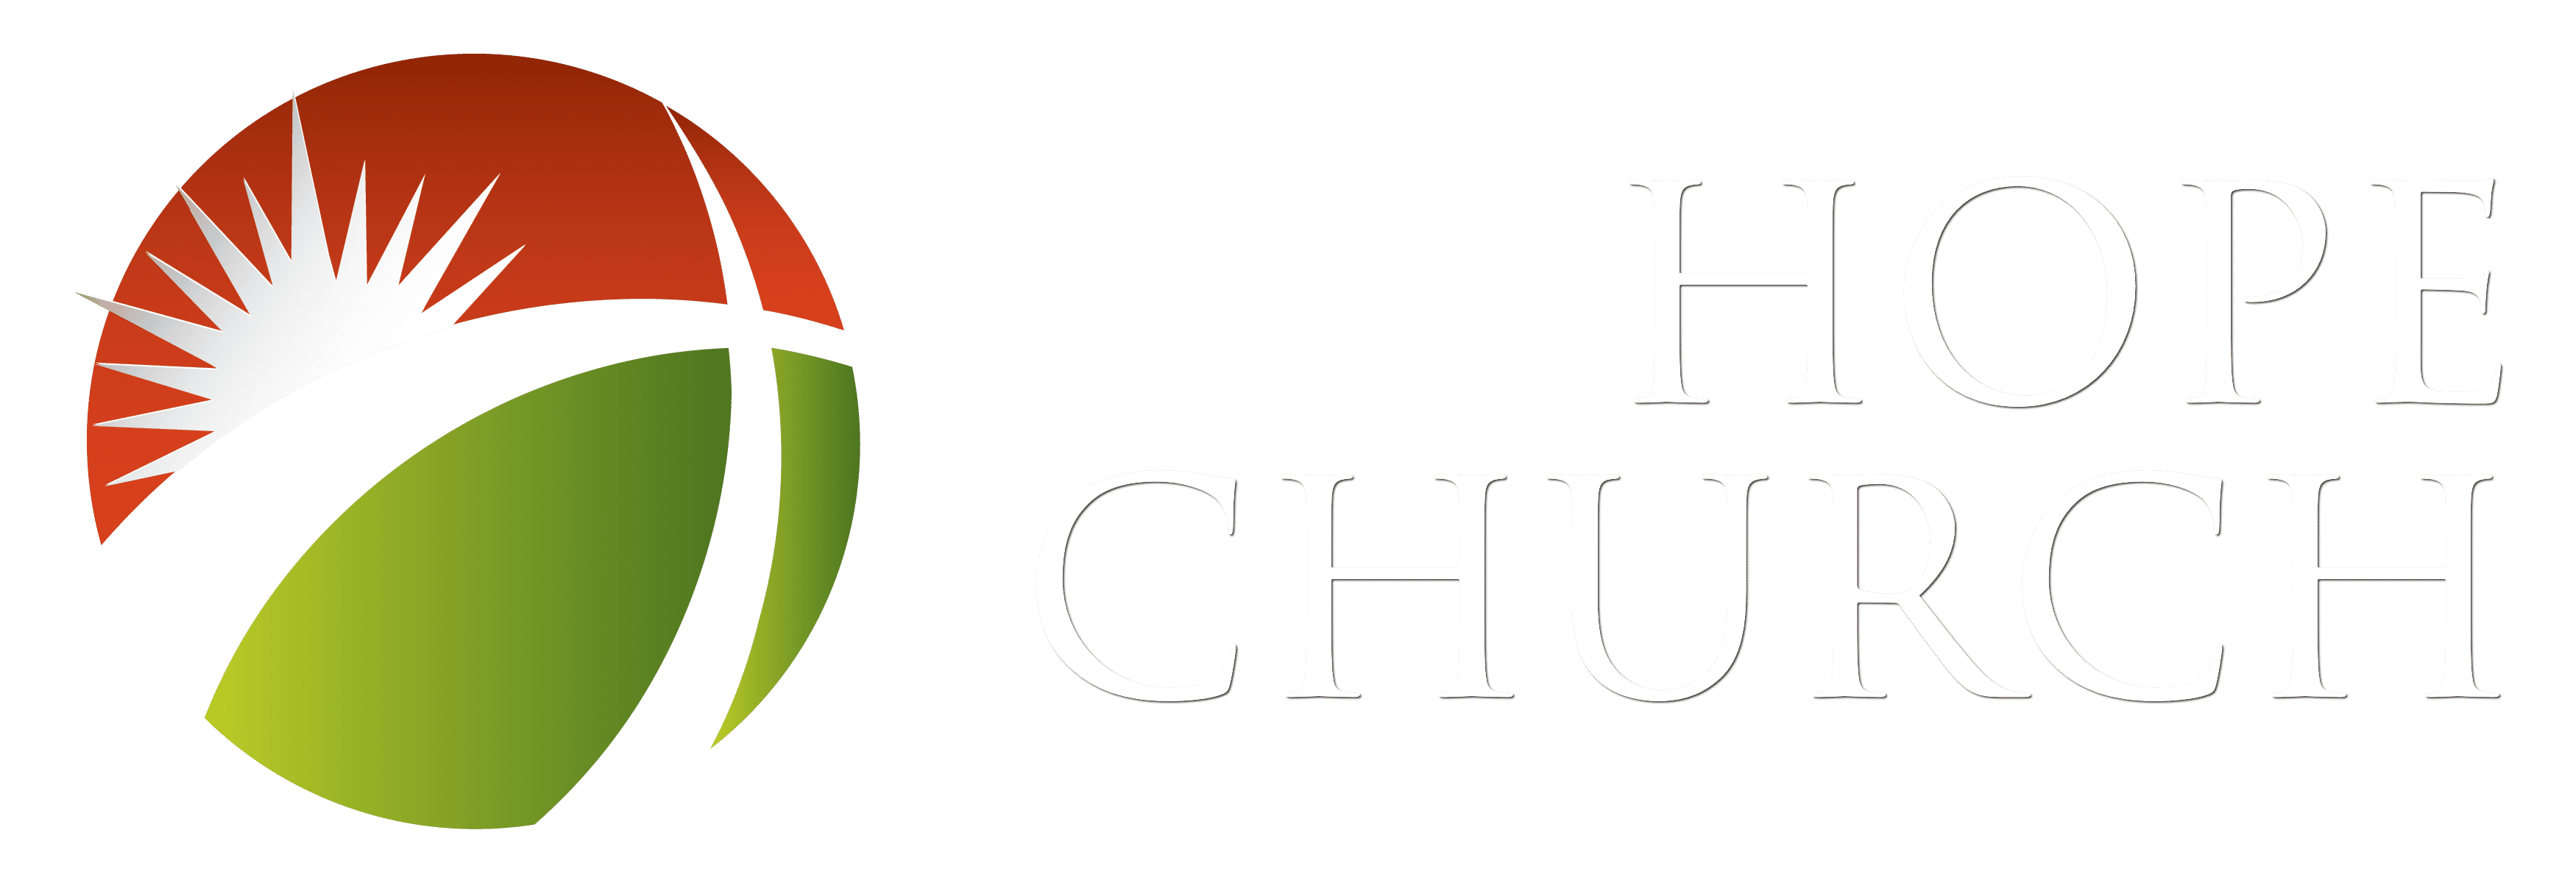 Hcb logo 2017